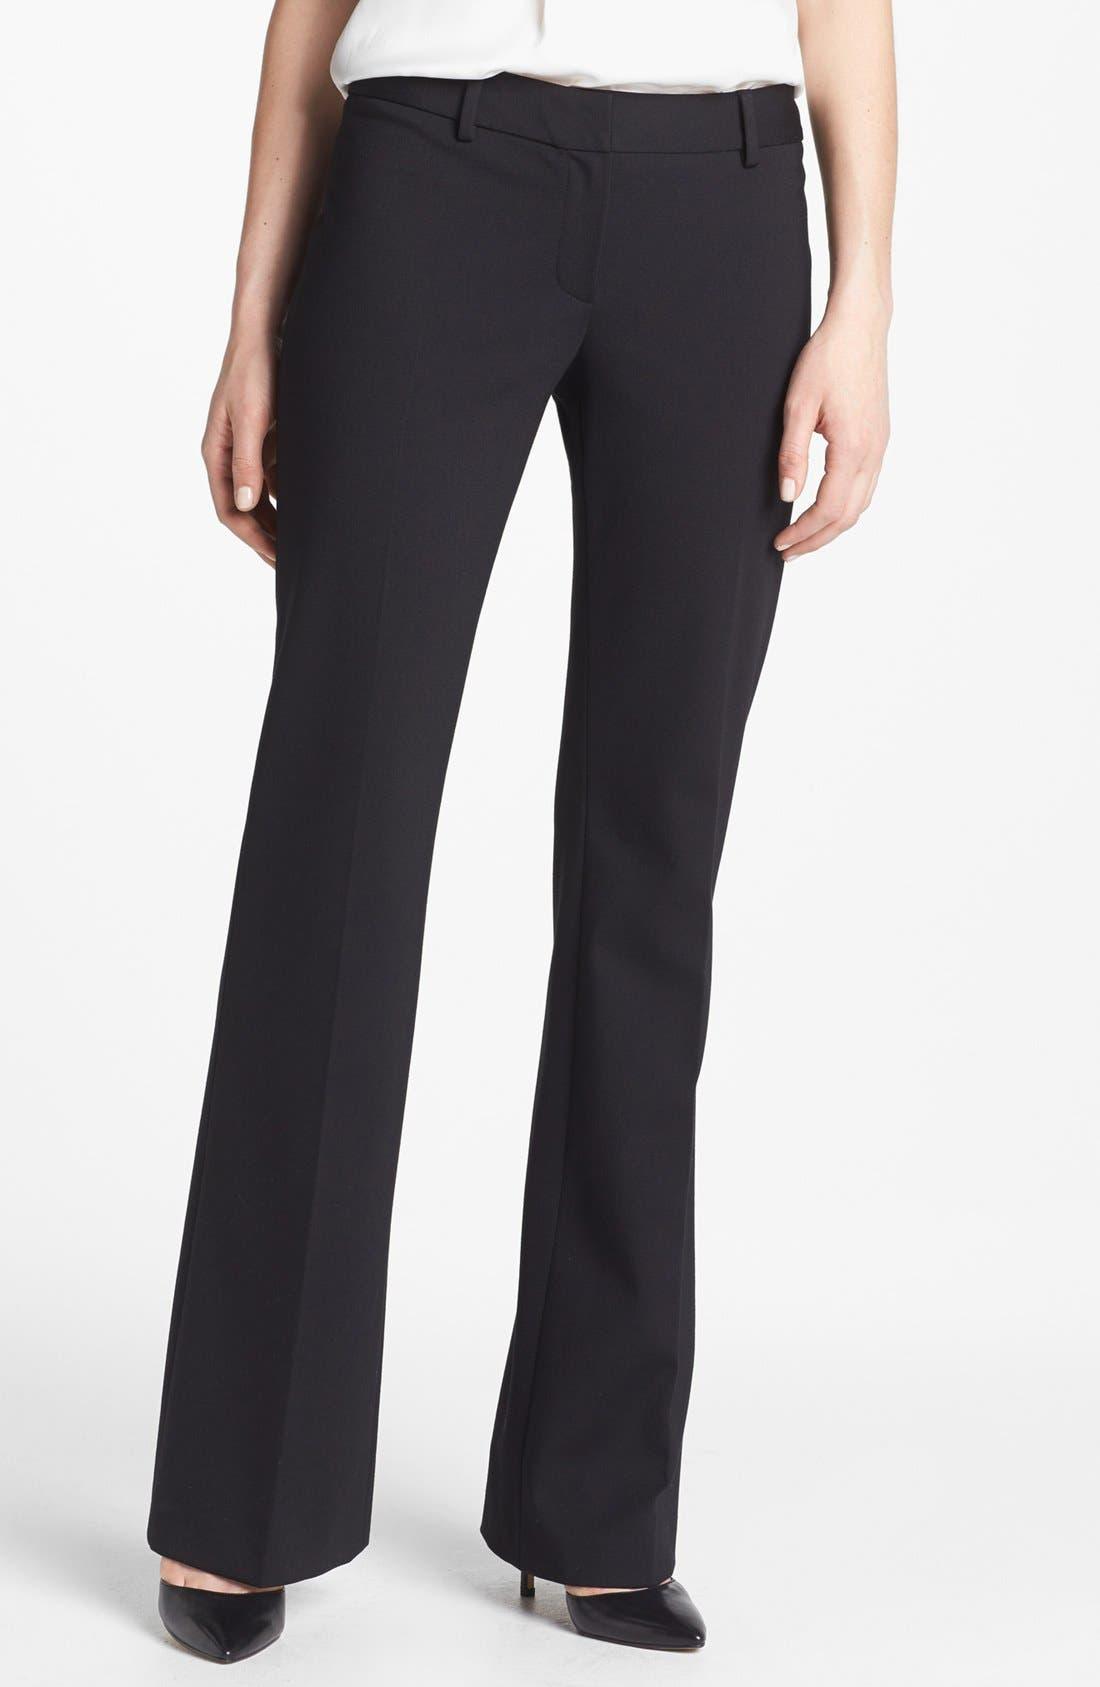 Alternate Image 1 Selected - Elie Tahari 'Verda' Trousers